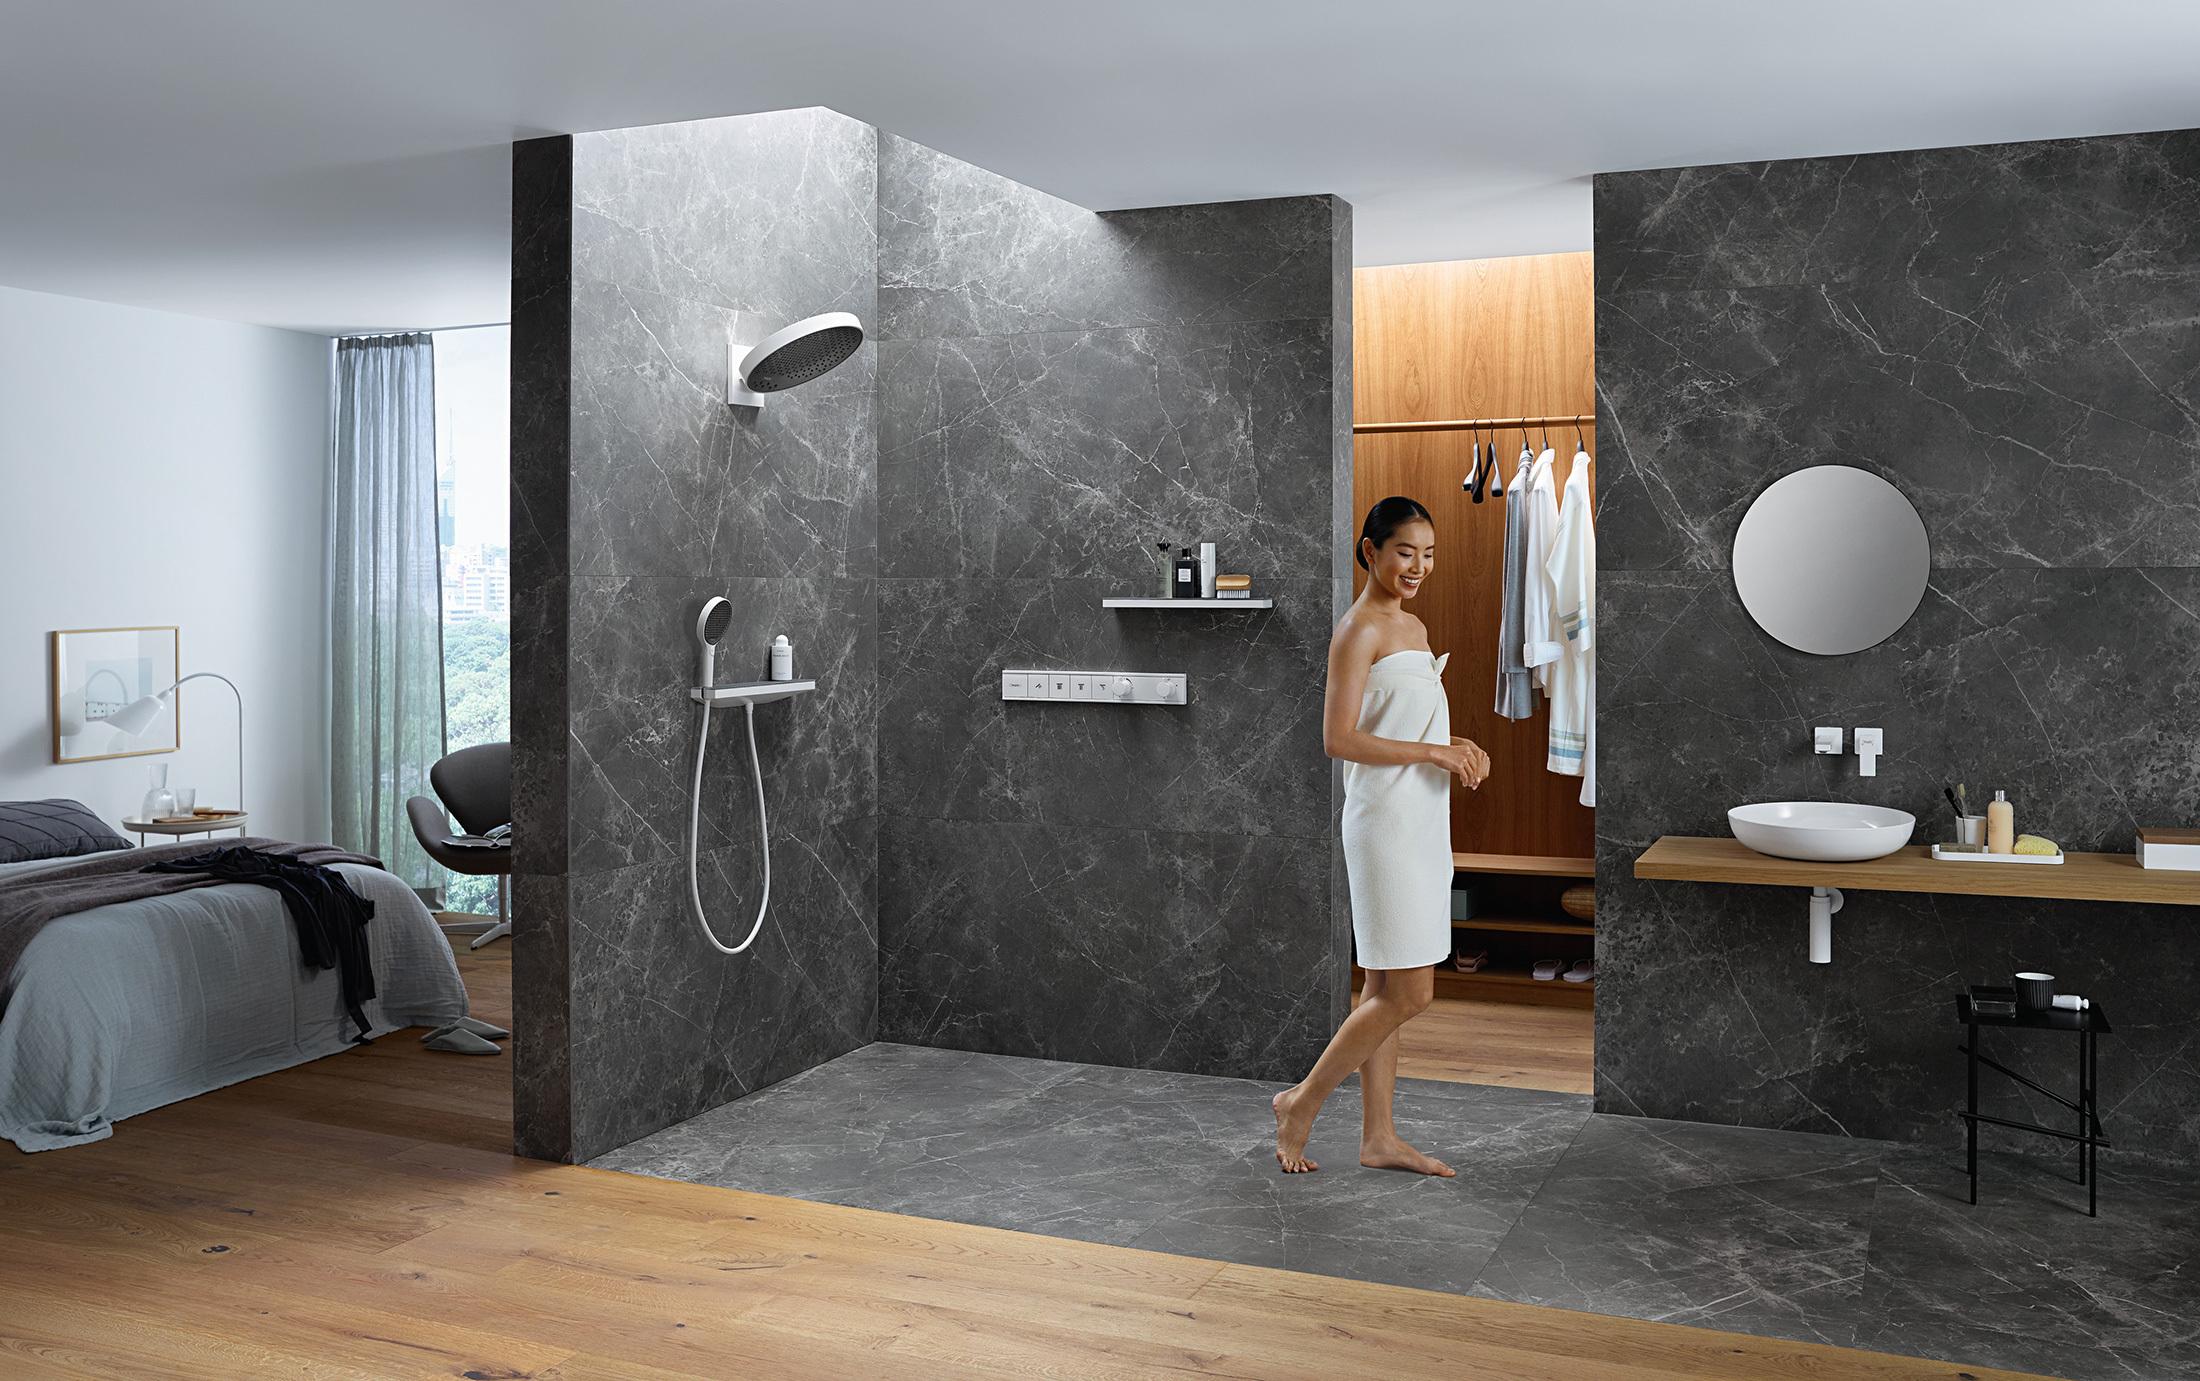 Hans Bathroom Heating Lamp